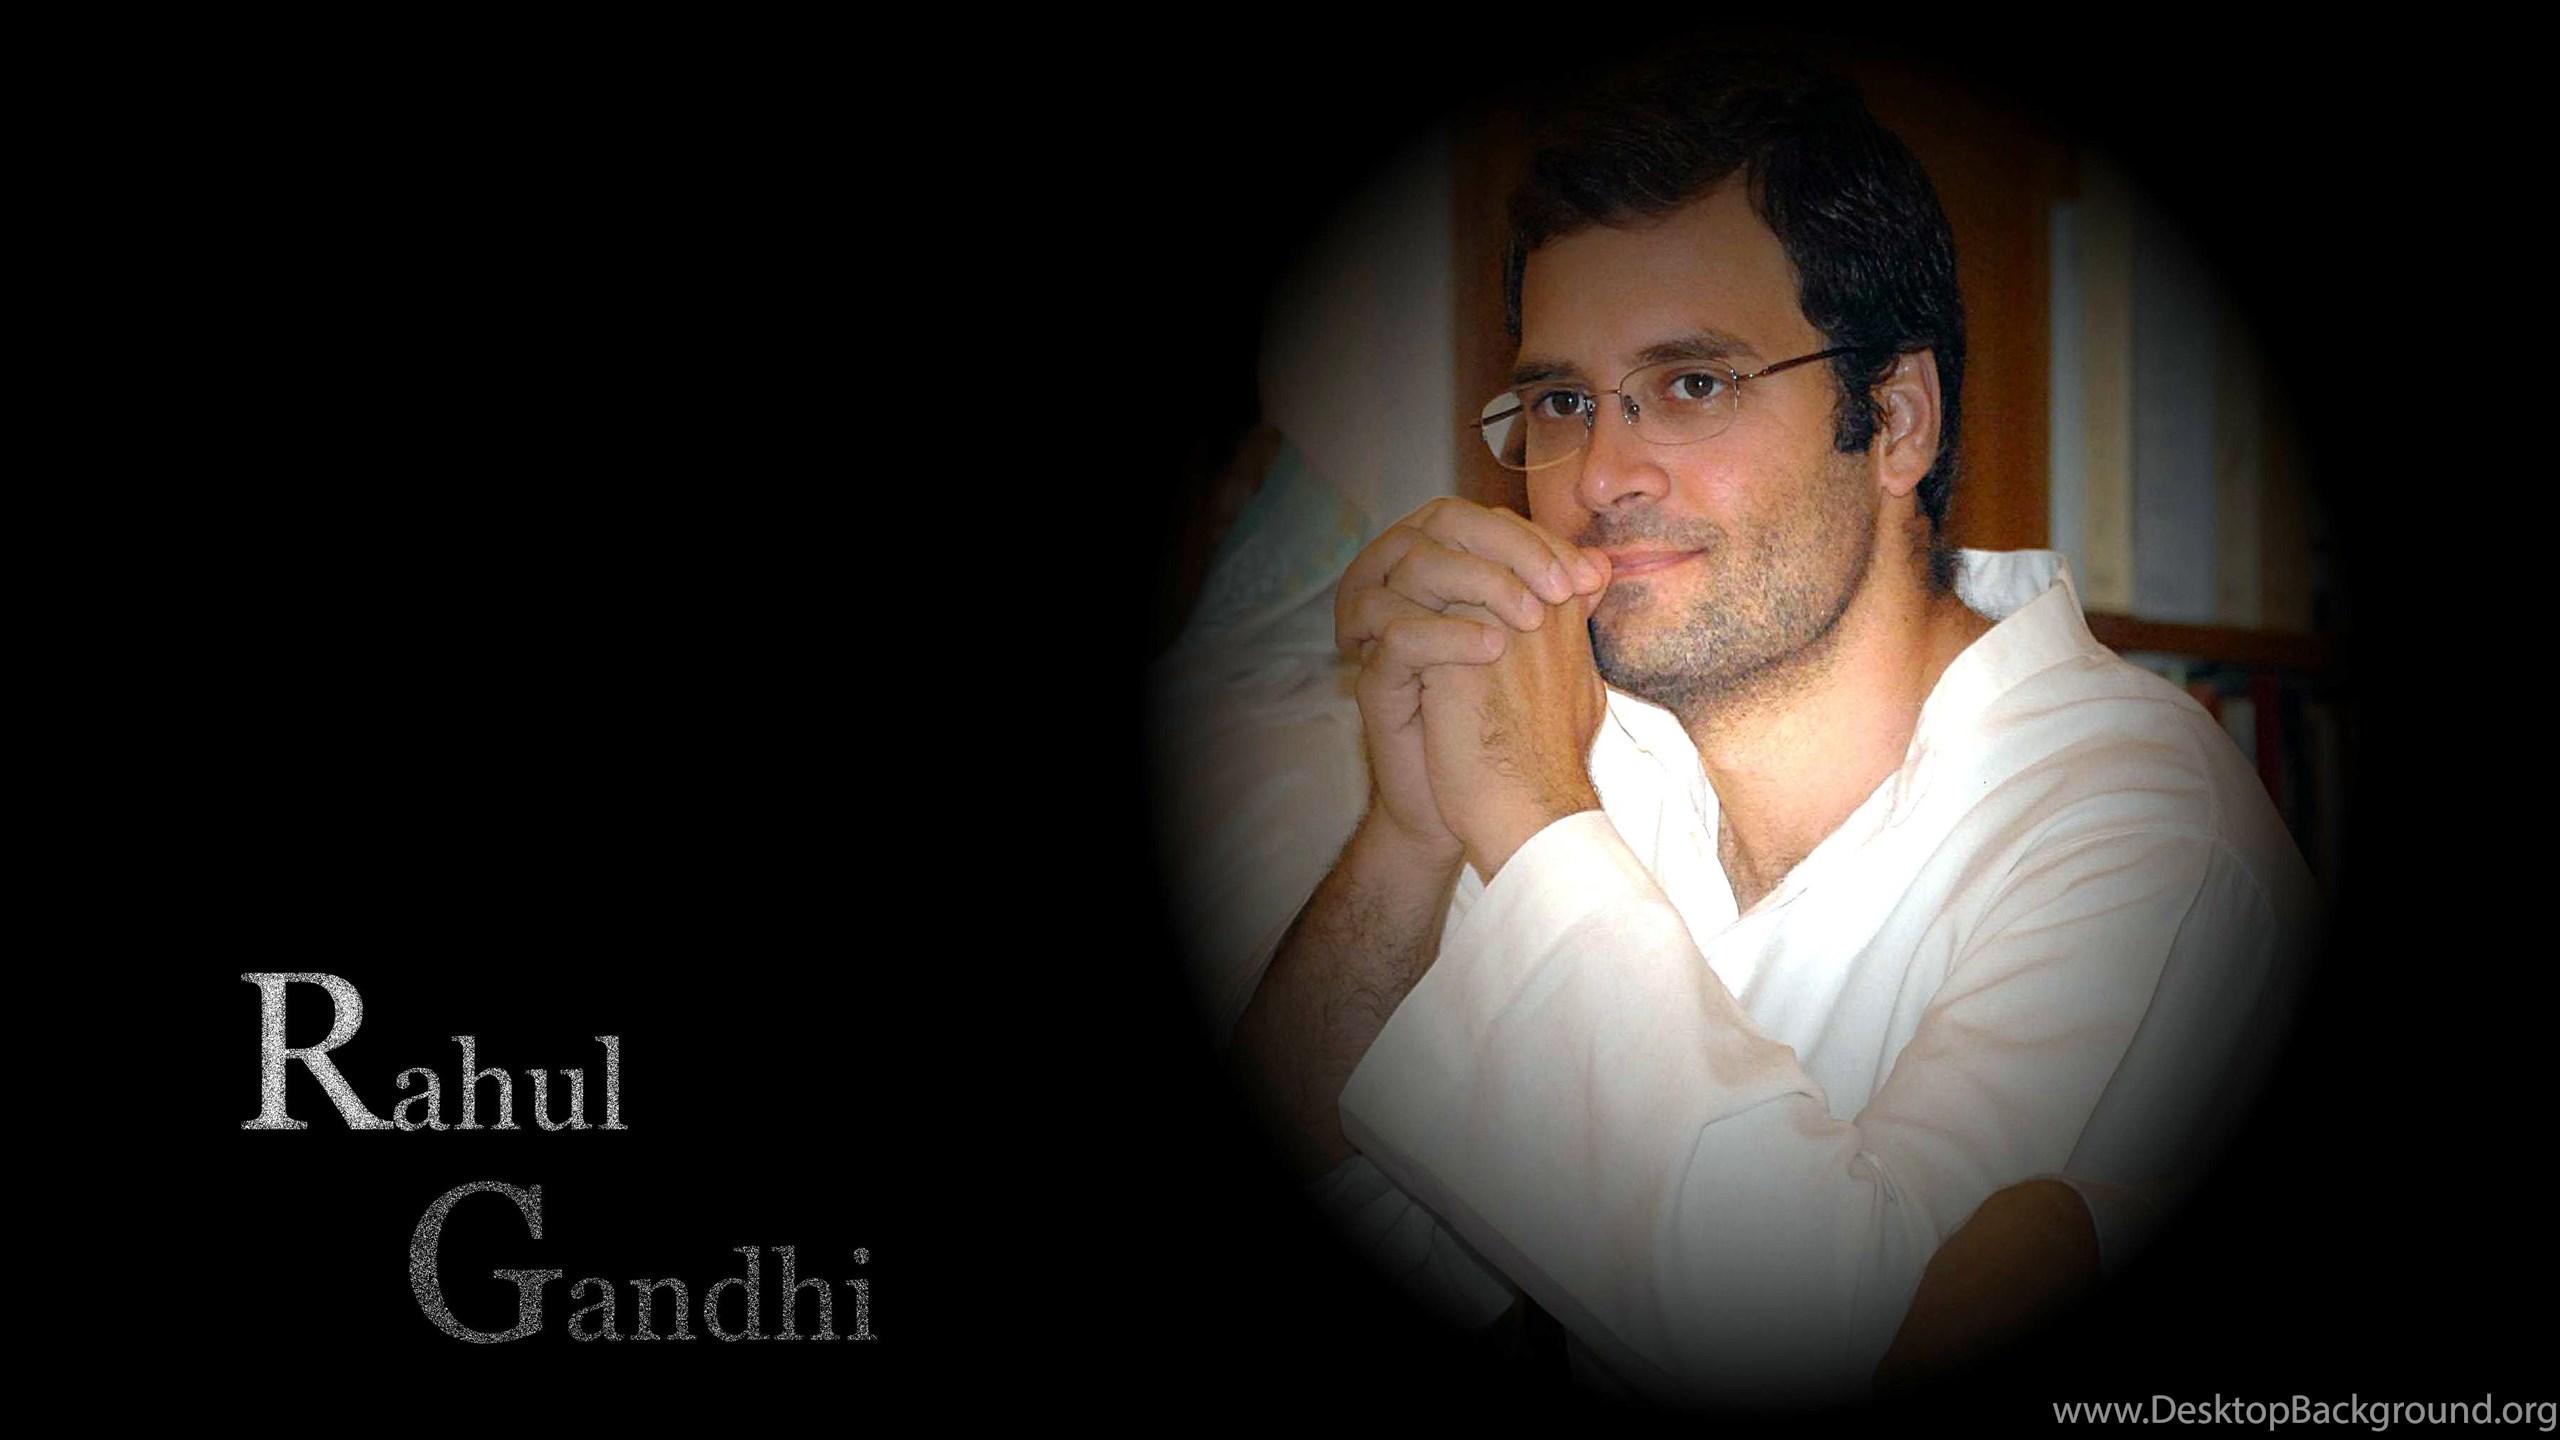 Congress Plitician Rahul Gandhi Wallpapers Desktop Background